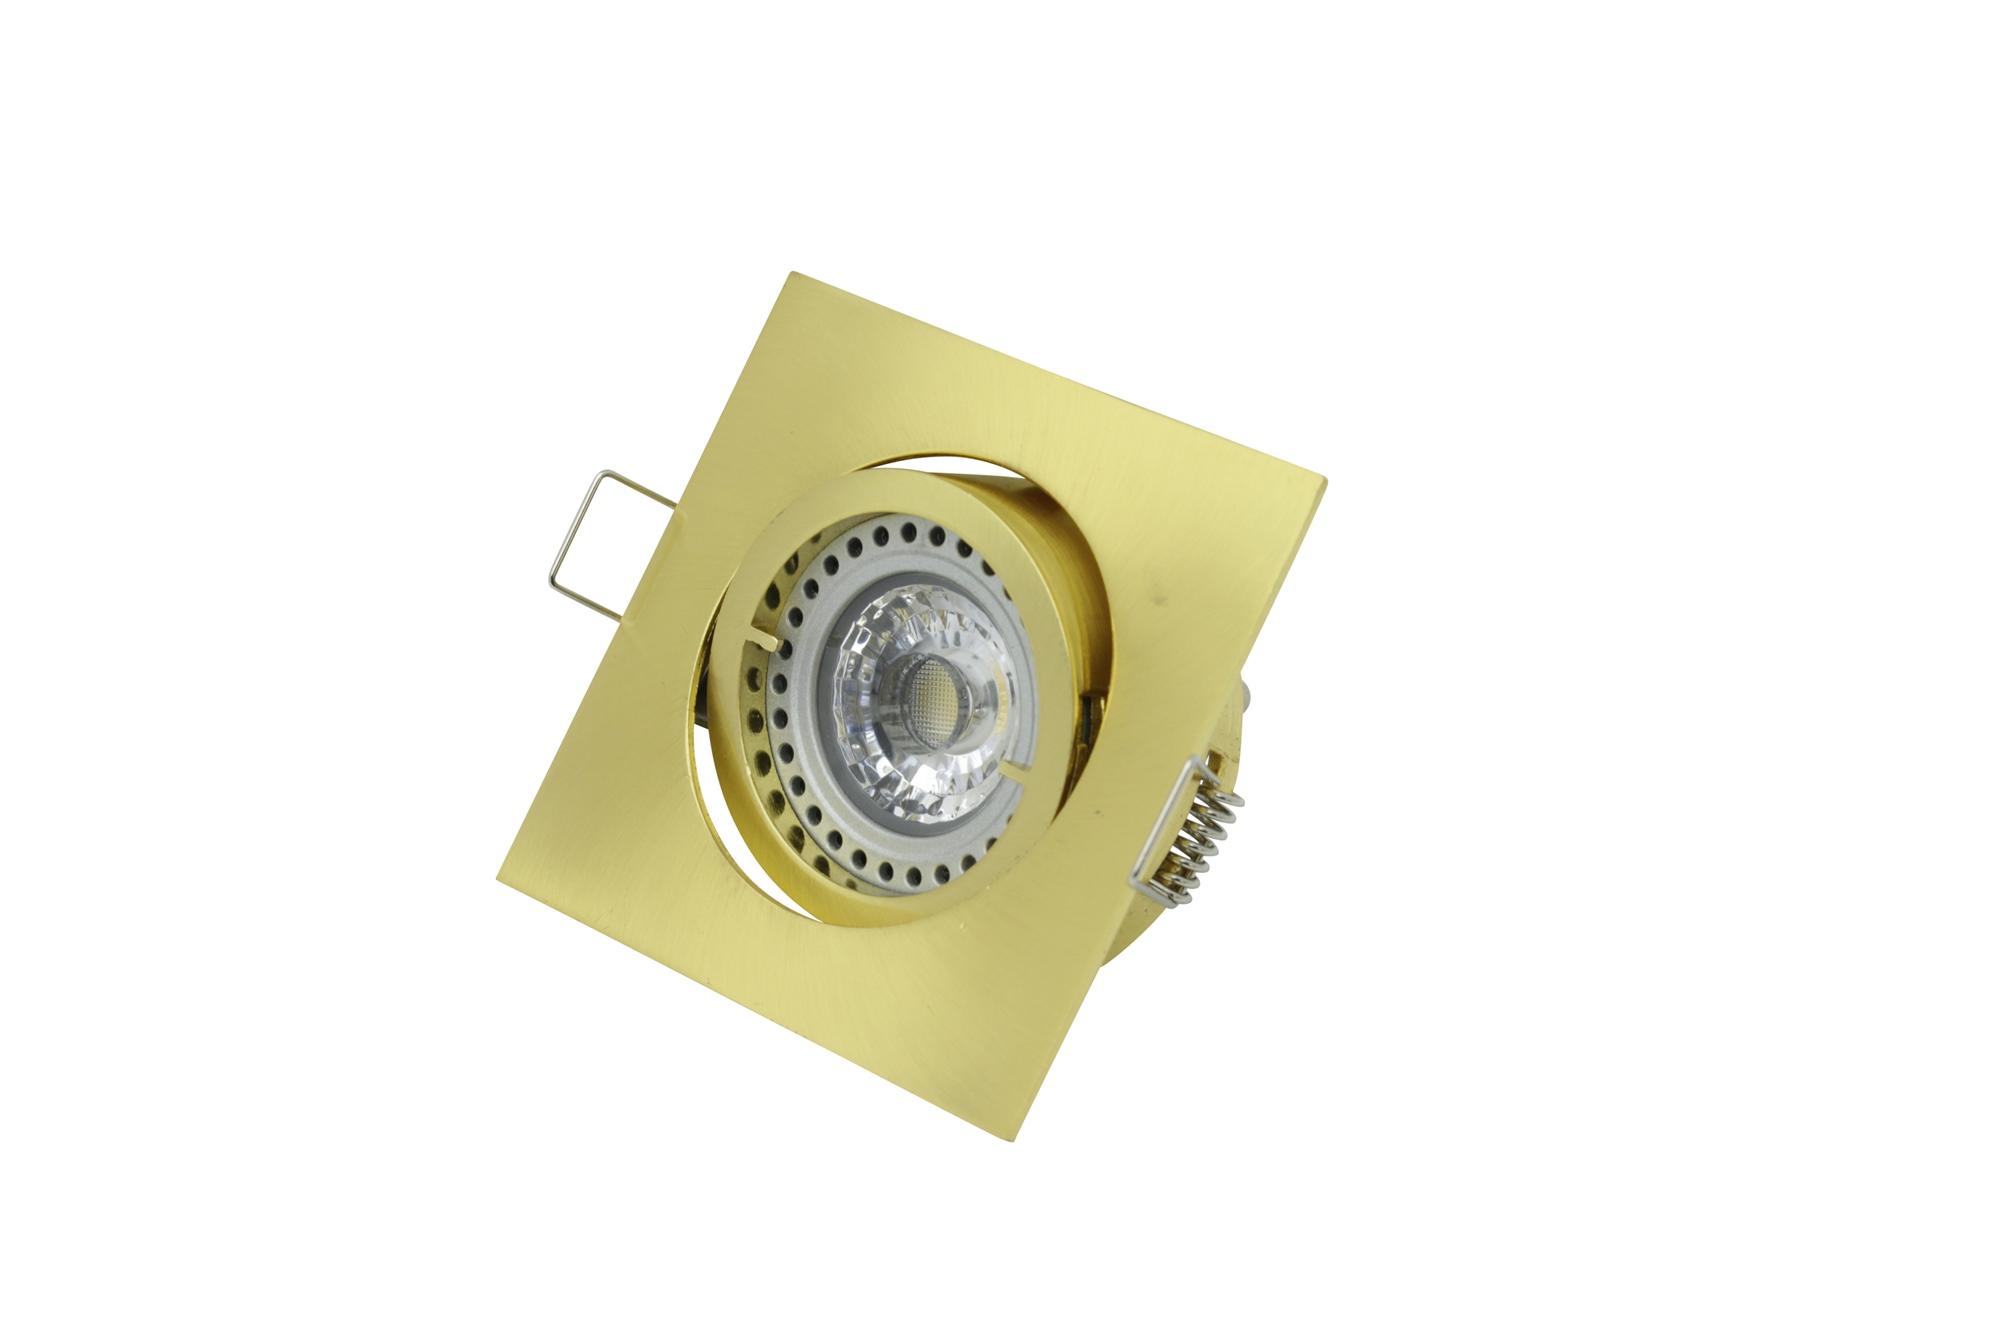 Lampenlux LED-Einbaustrahler Spot Snap eckig gold schwenkbar 8.2x8.2cm 12V MR16 rostfrei Aluminium